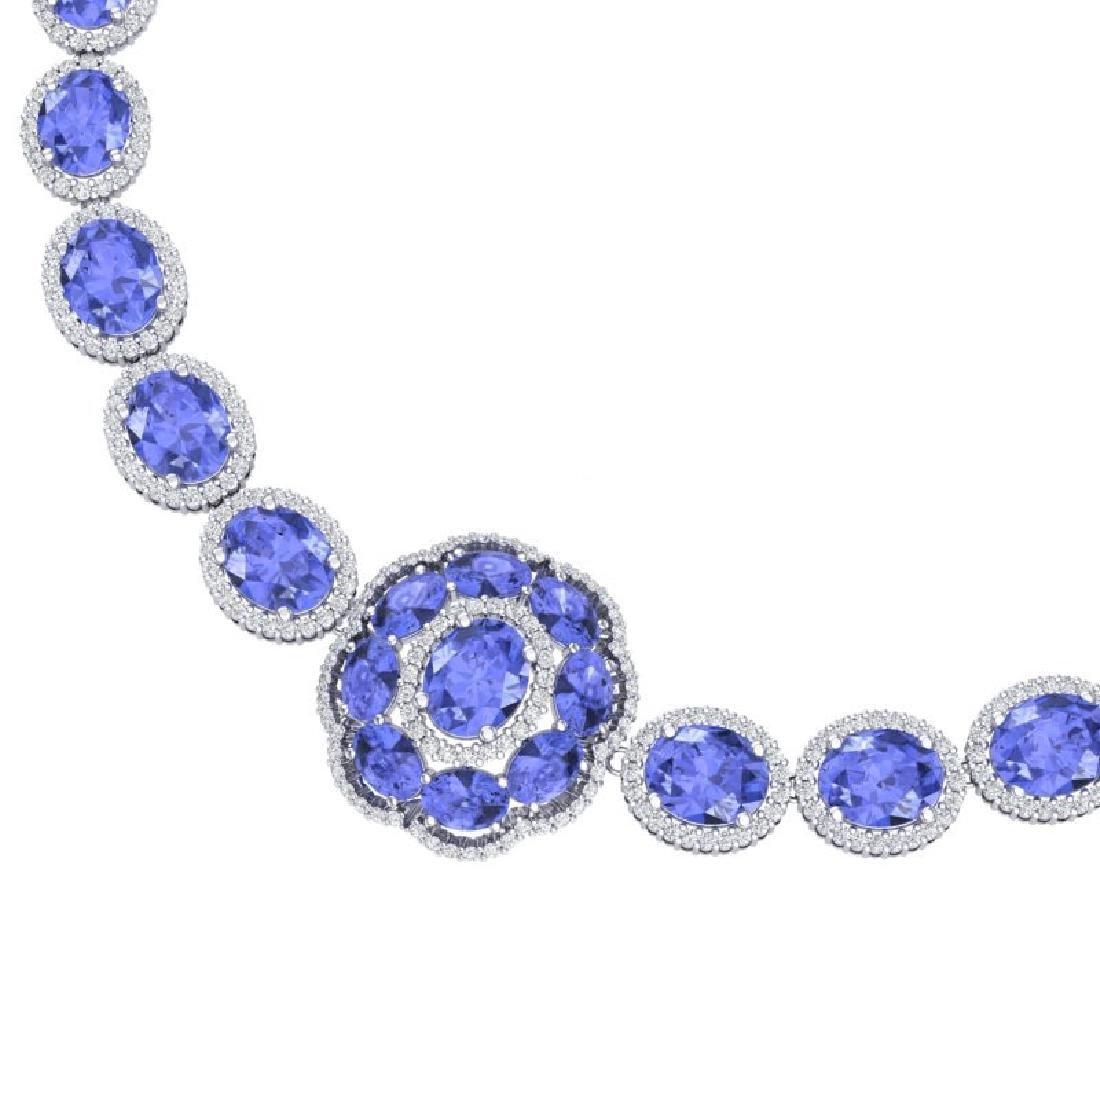 81.27 CTW Royalty Tanzanite & VS Diamond Necklace 18K